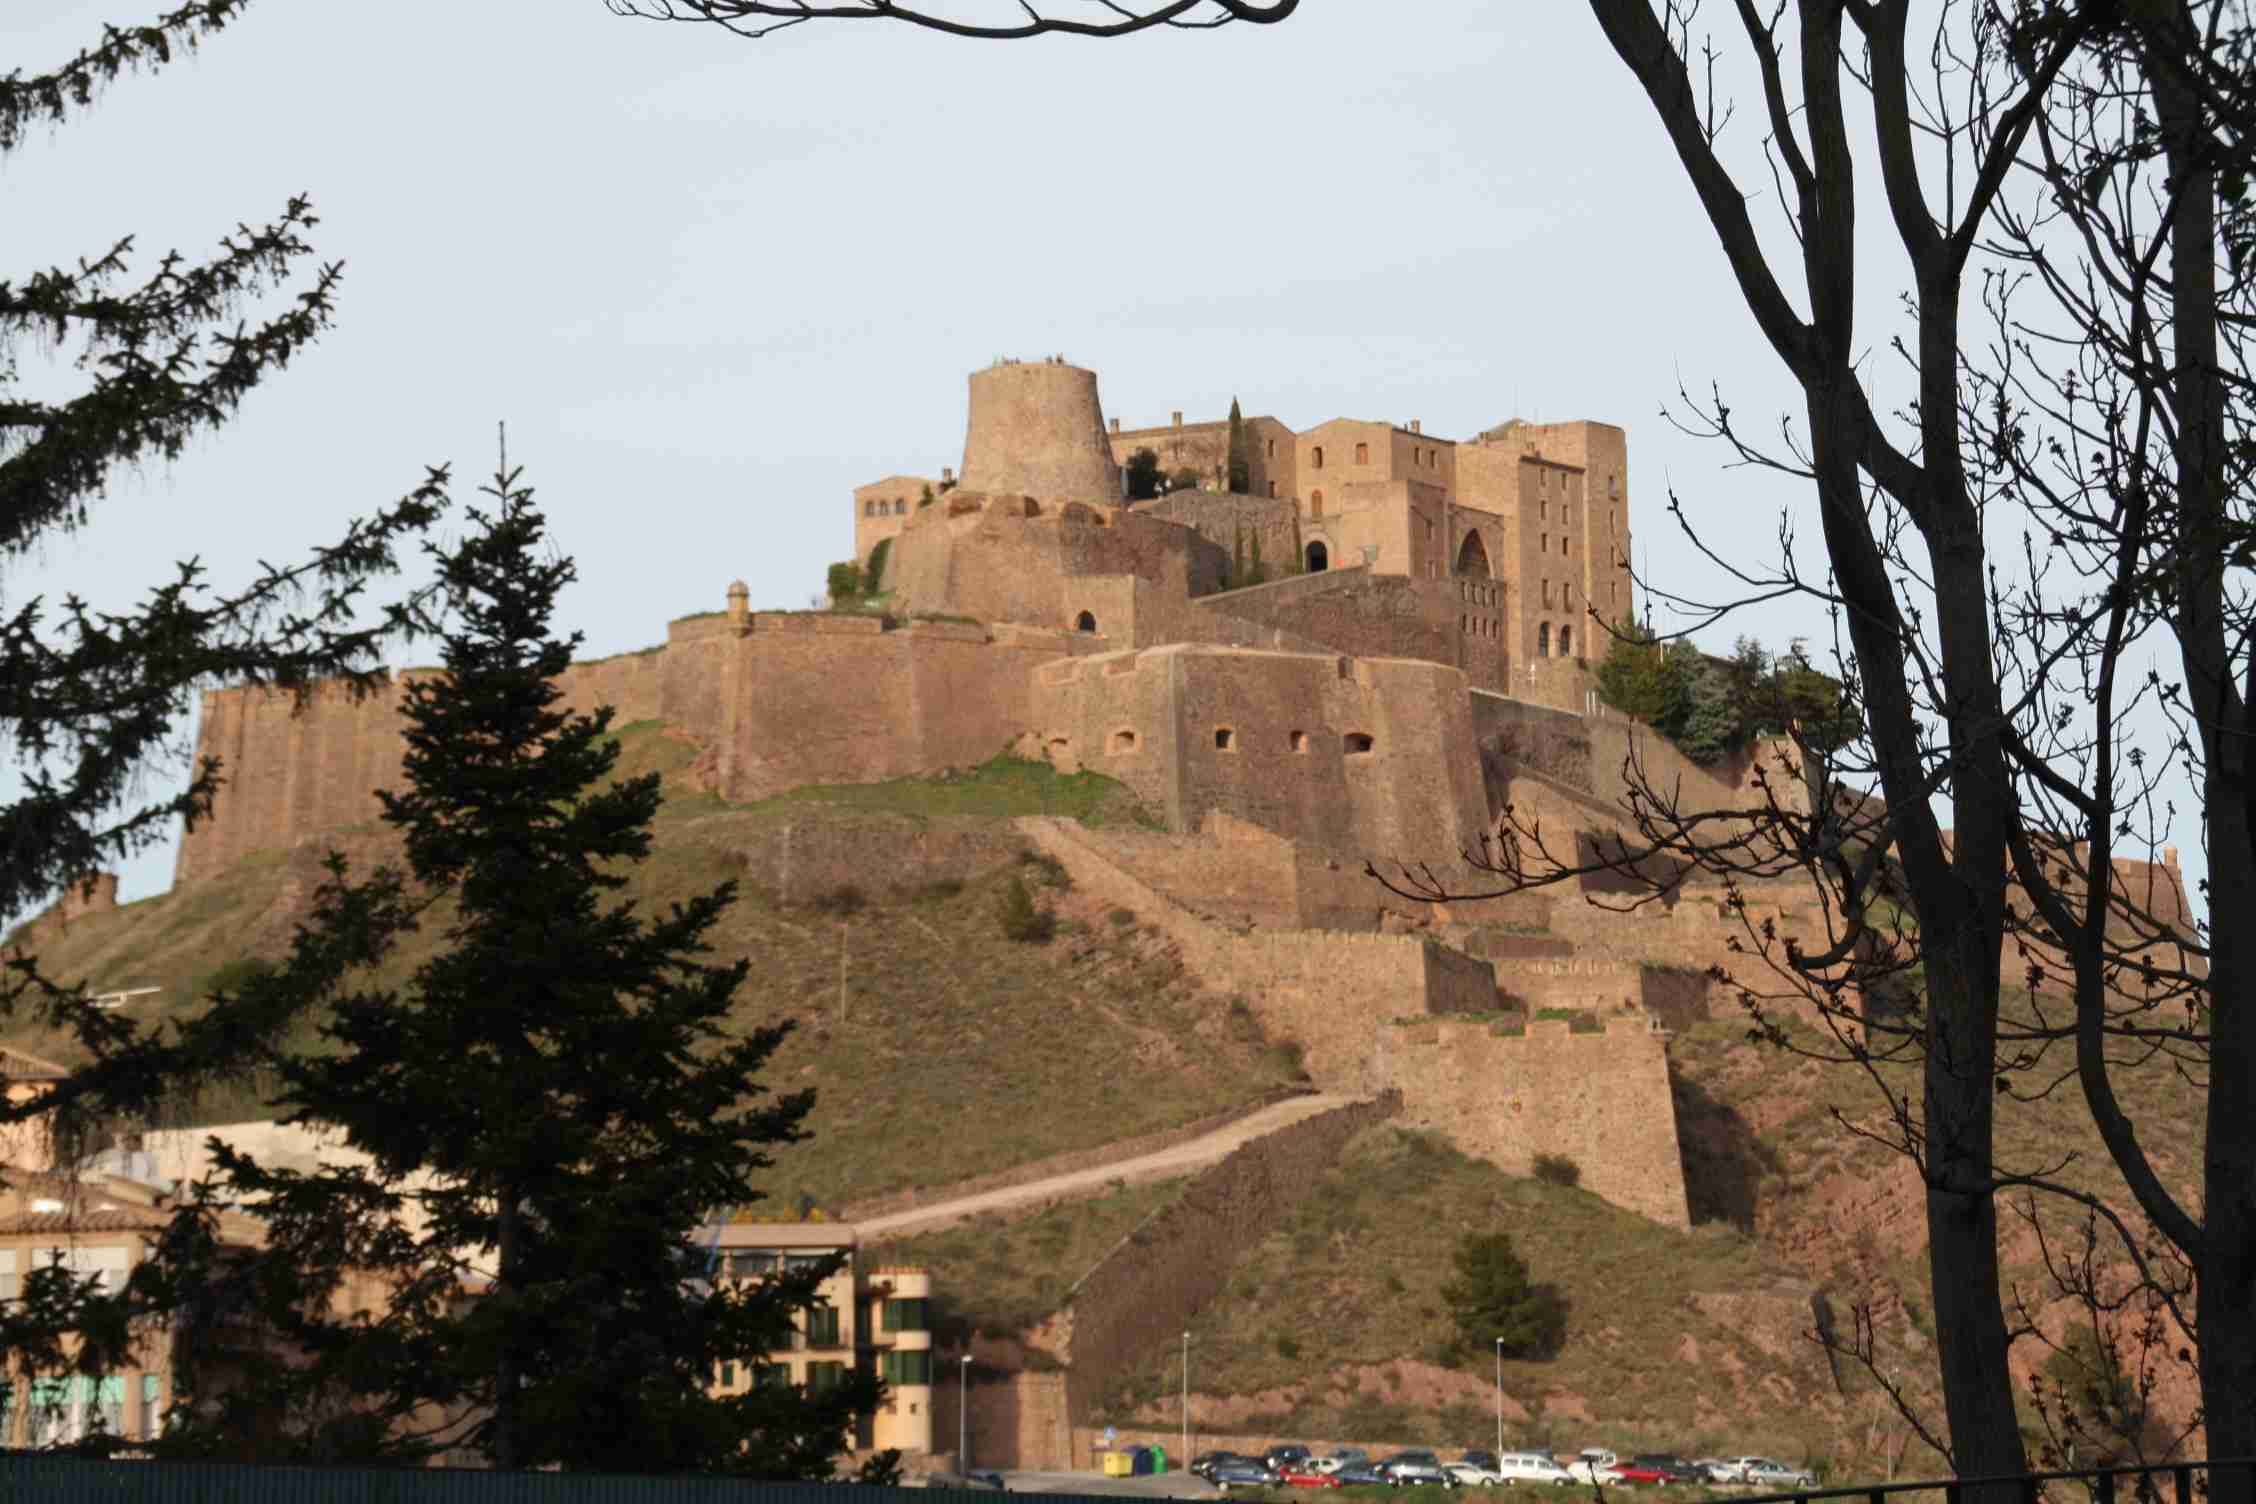 El Castell de Cardona (Cardona's Castle)